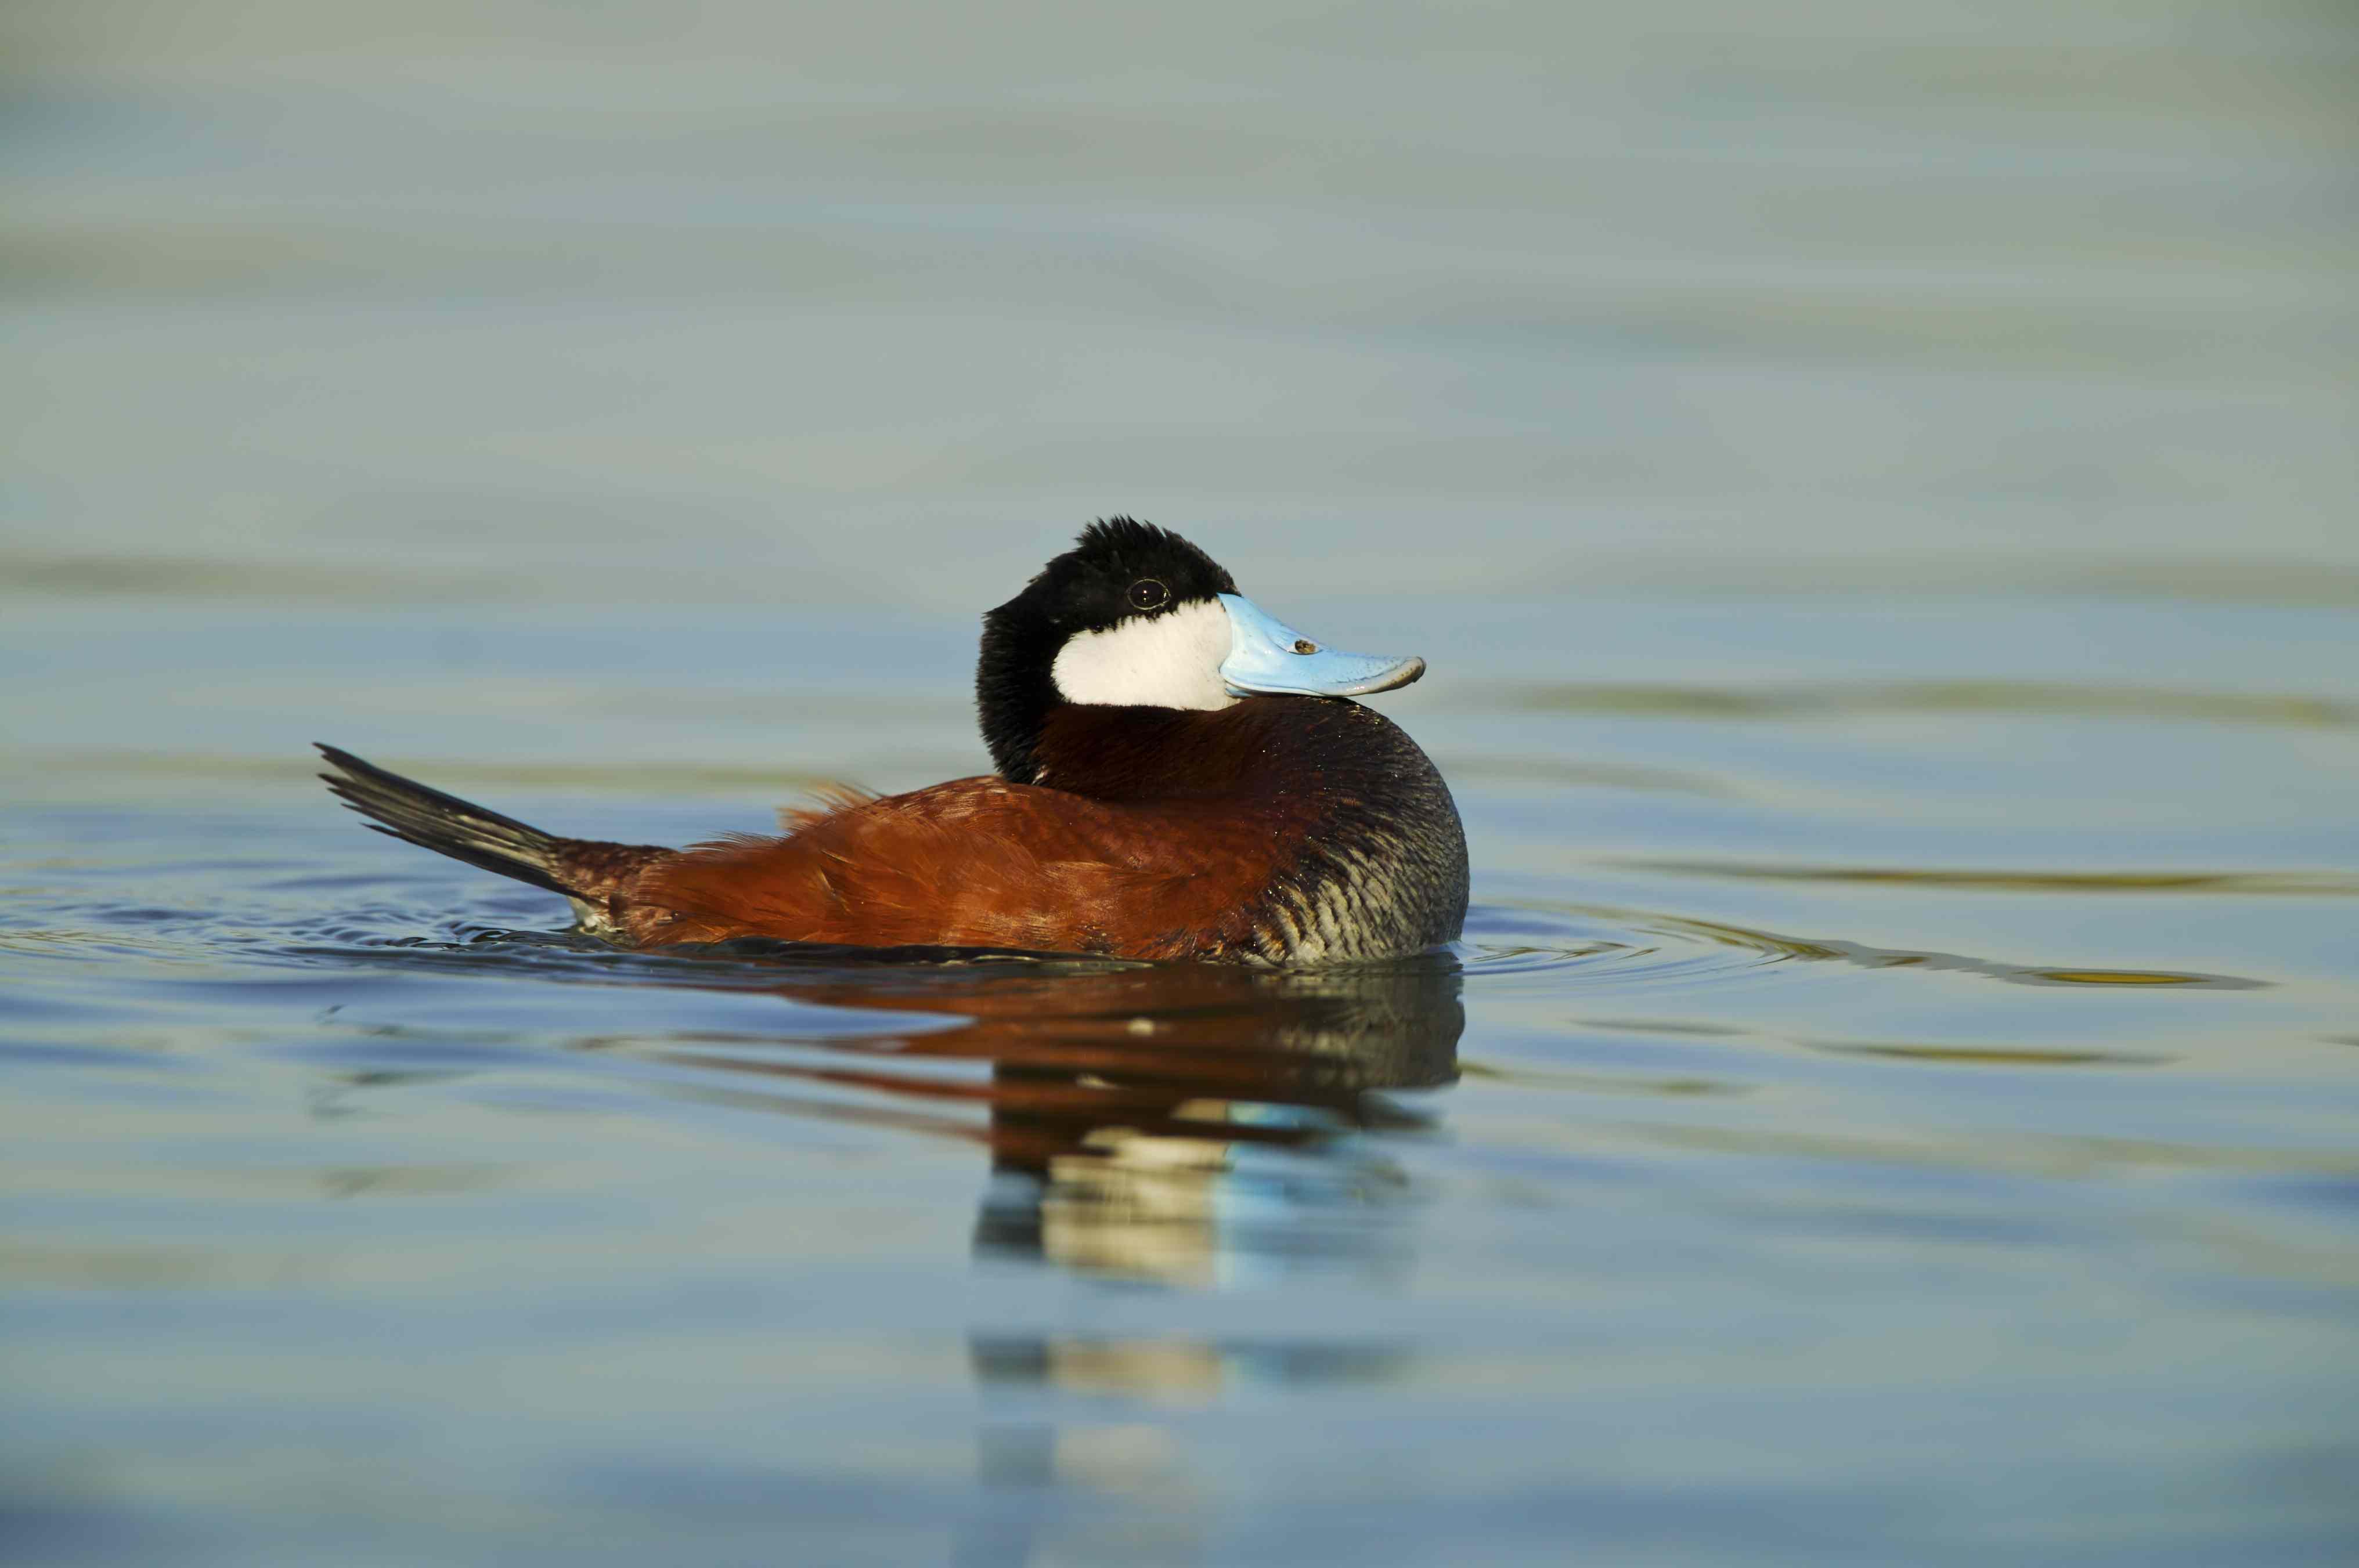 Male ruddy duck in breeding plumage on the water